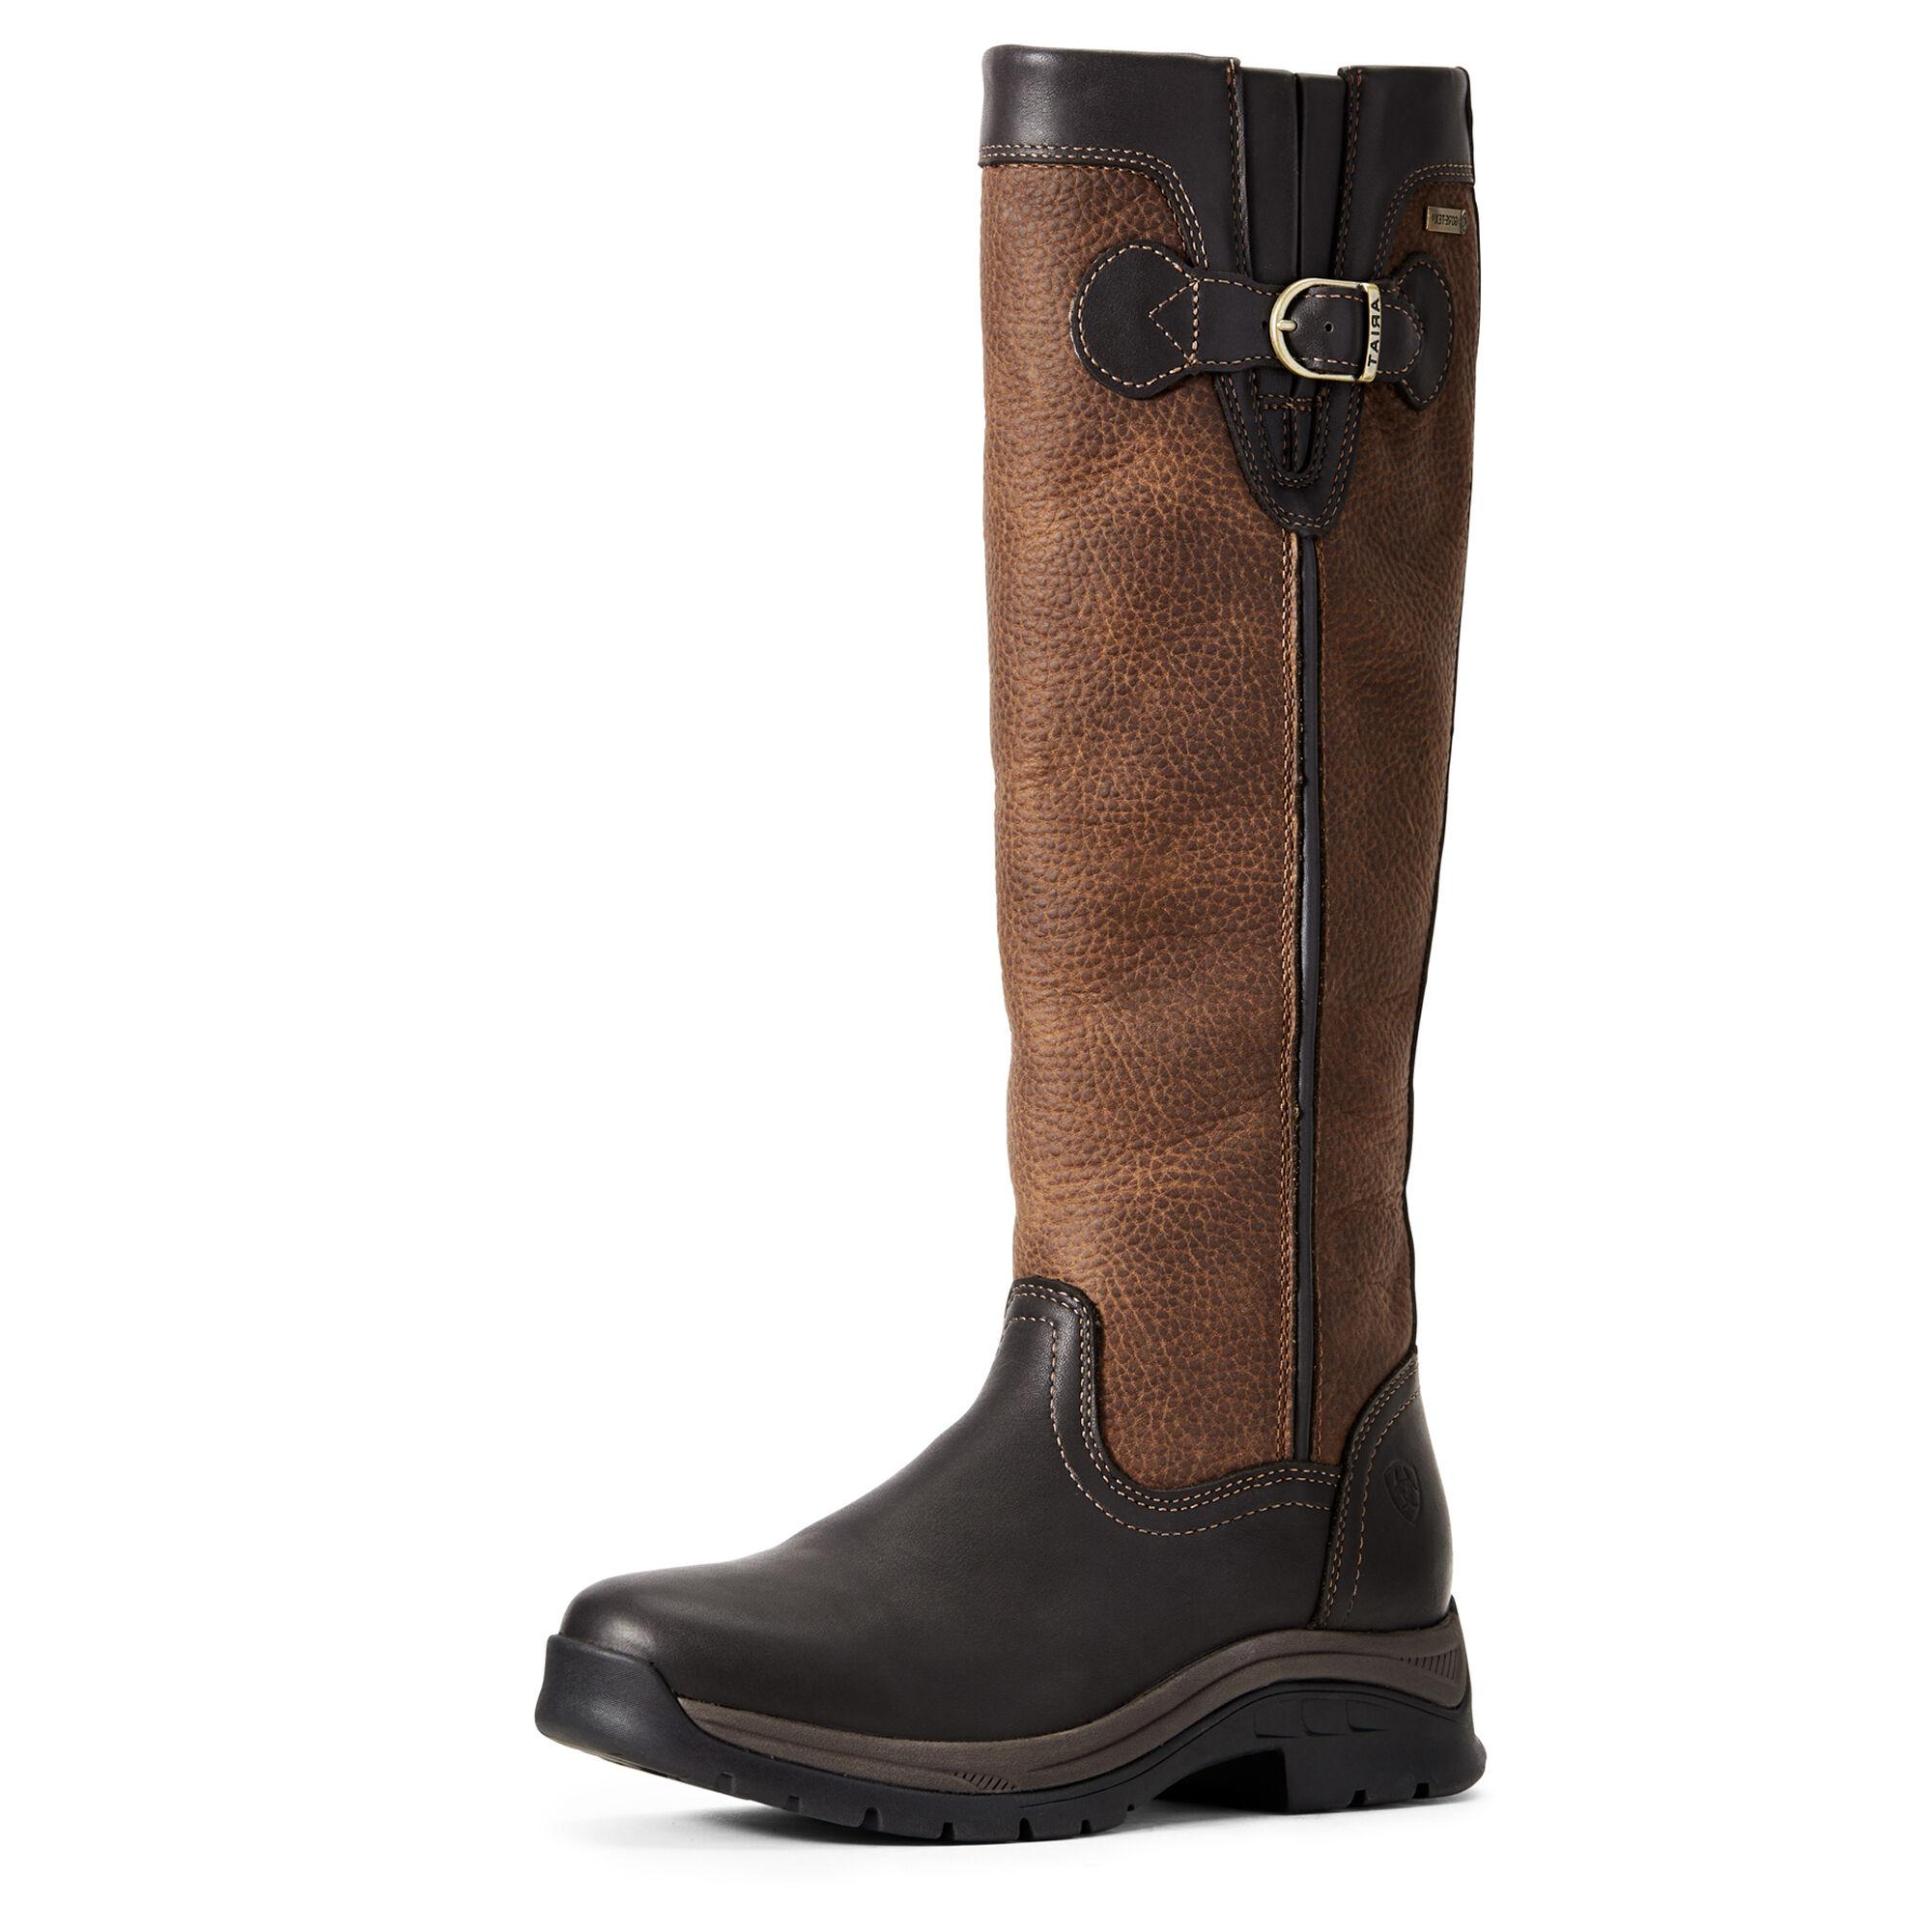 Women's Belford GORE-TEX Boots in Ebony by Ariat